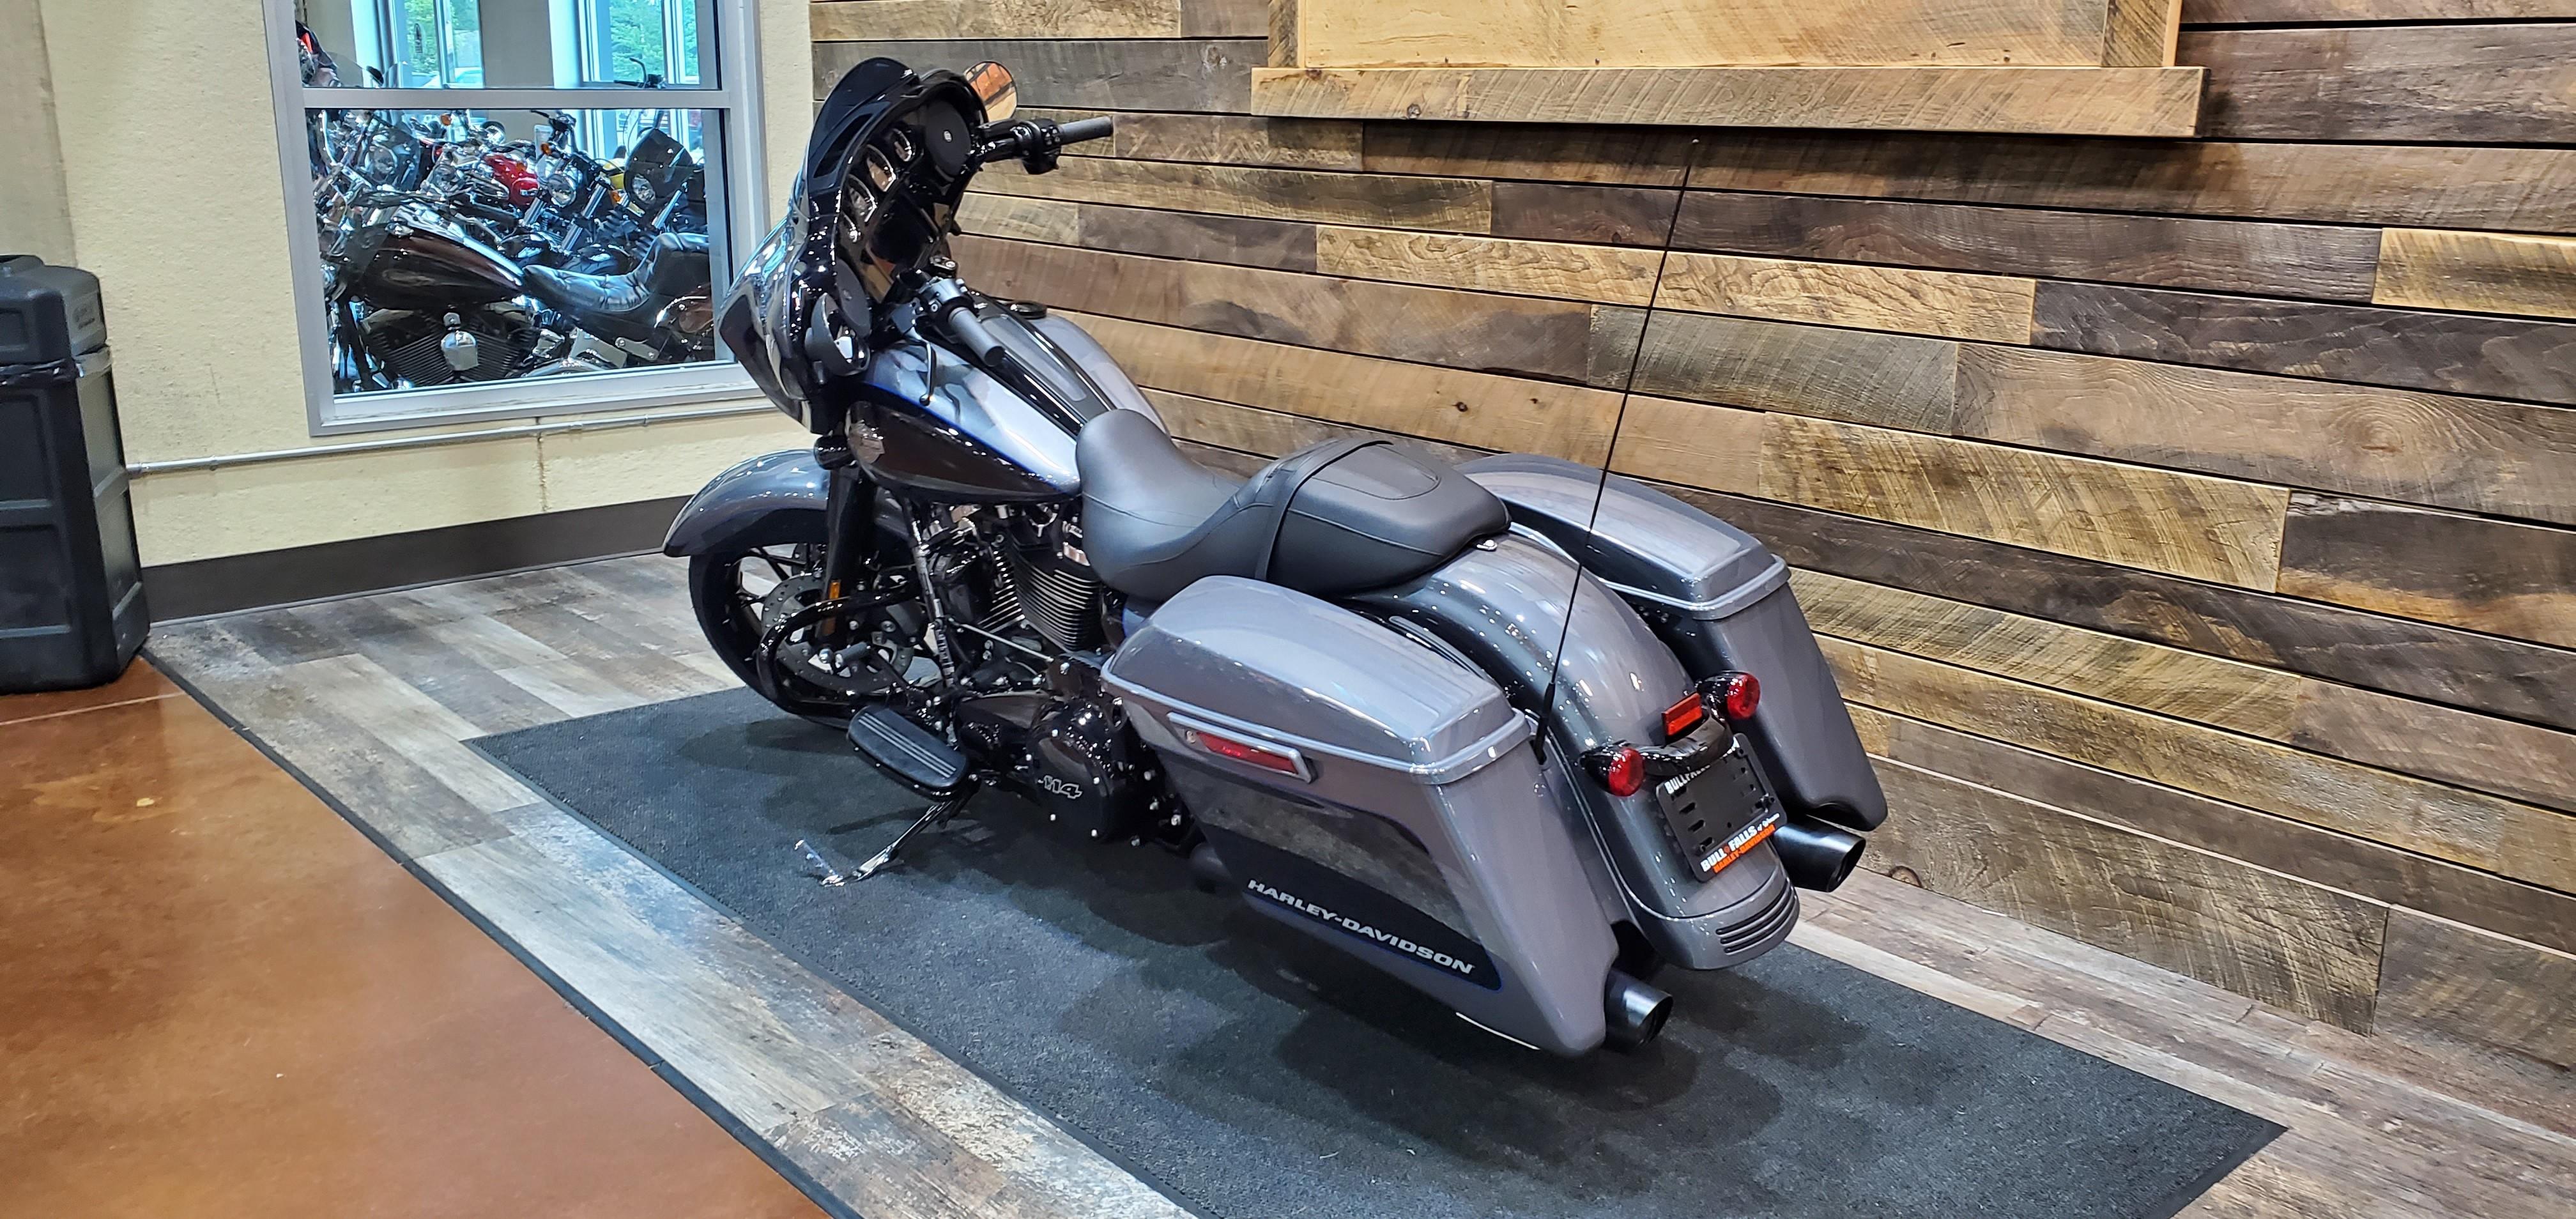 2021 Harley-Davidson Grand American Touring Street Glide Special at Bull Falls Harley-Davidson